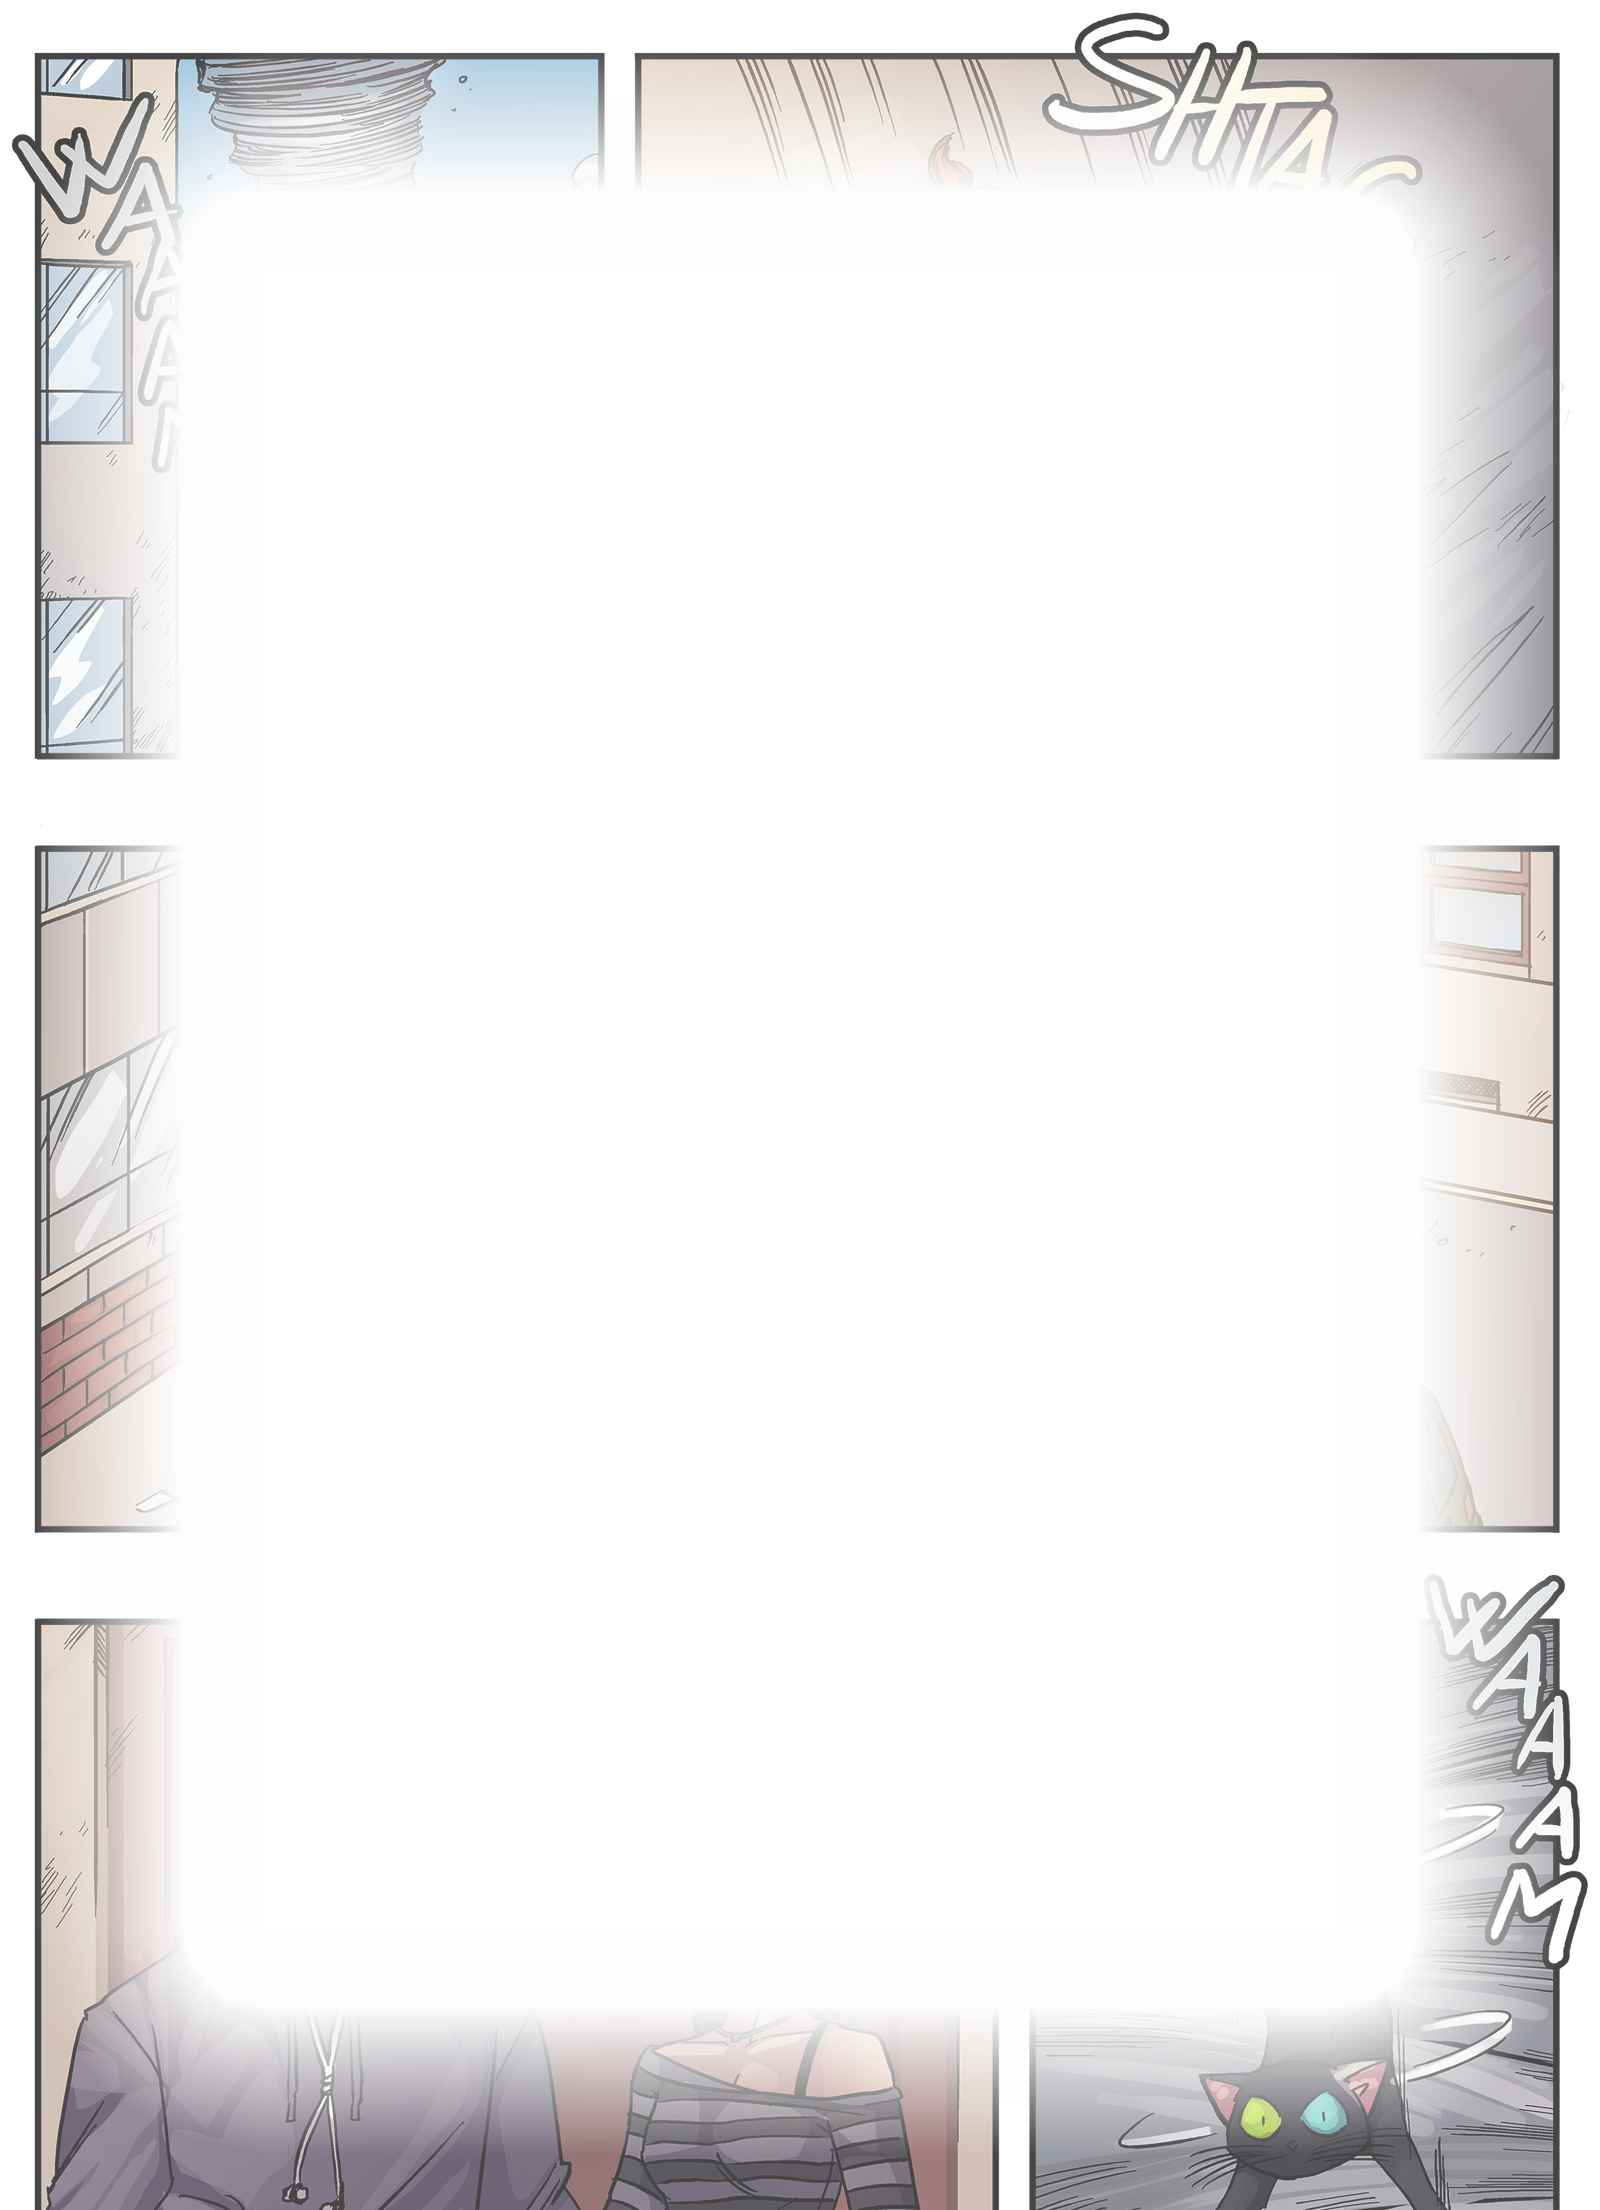 Hemispheres : Chapitre 6 page 11